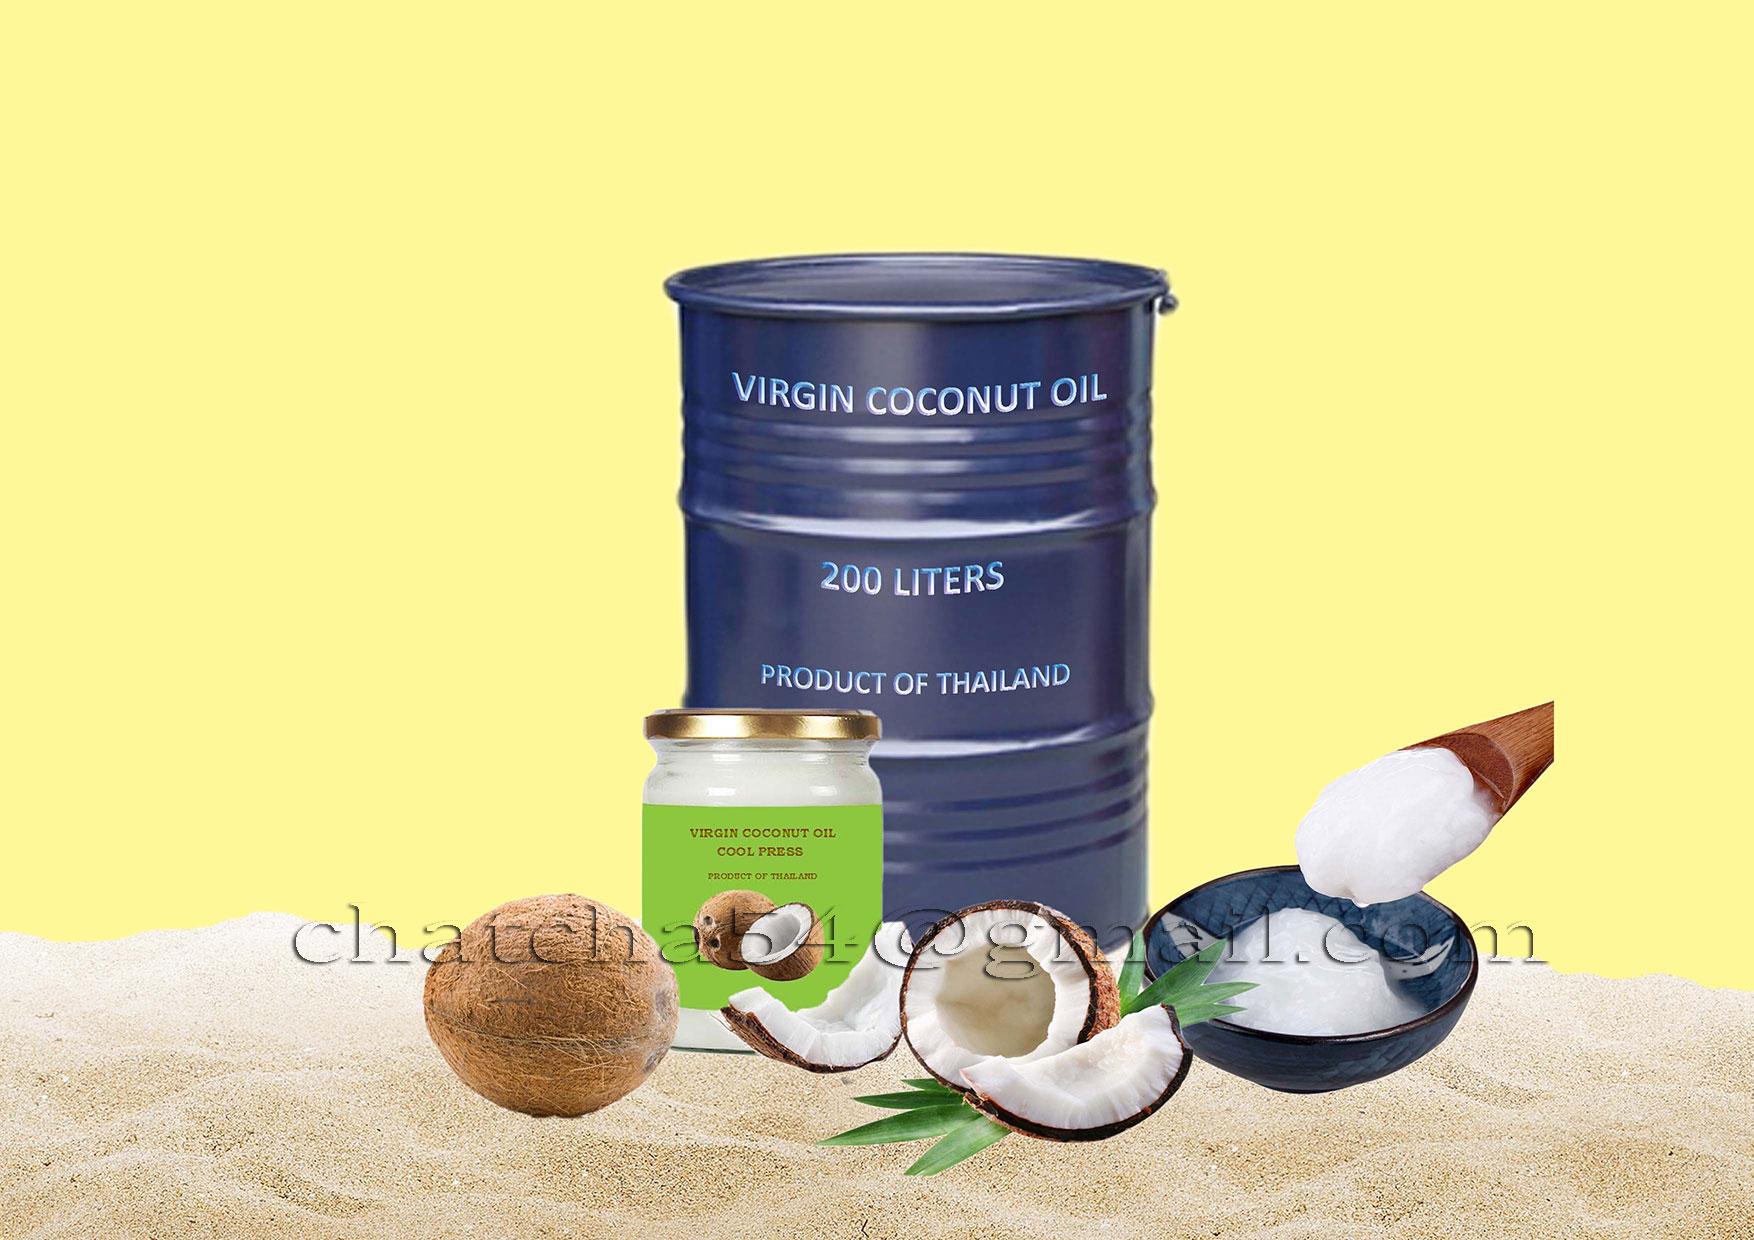 ORGANIC VIRGIN COCONUT OIL (COOL PRESS)